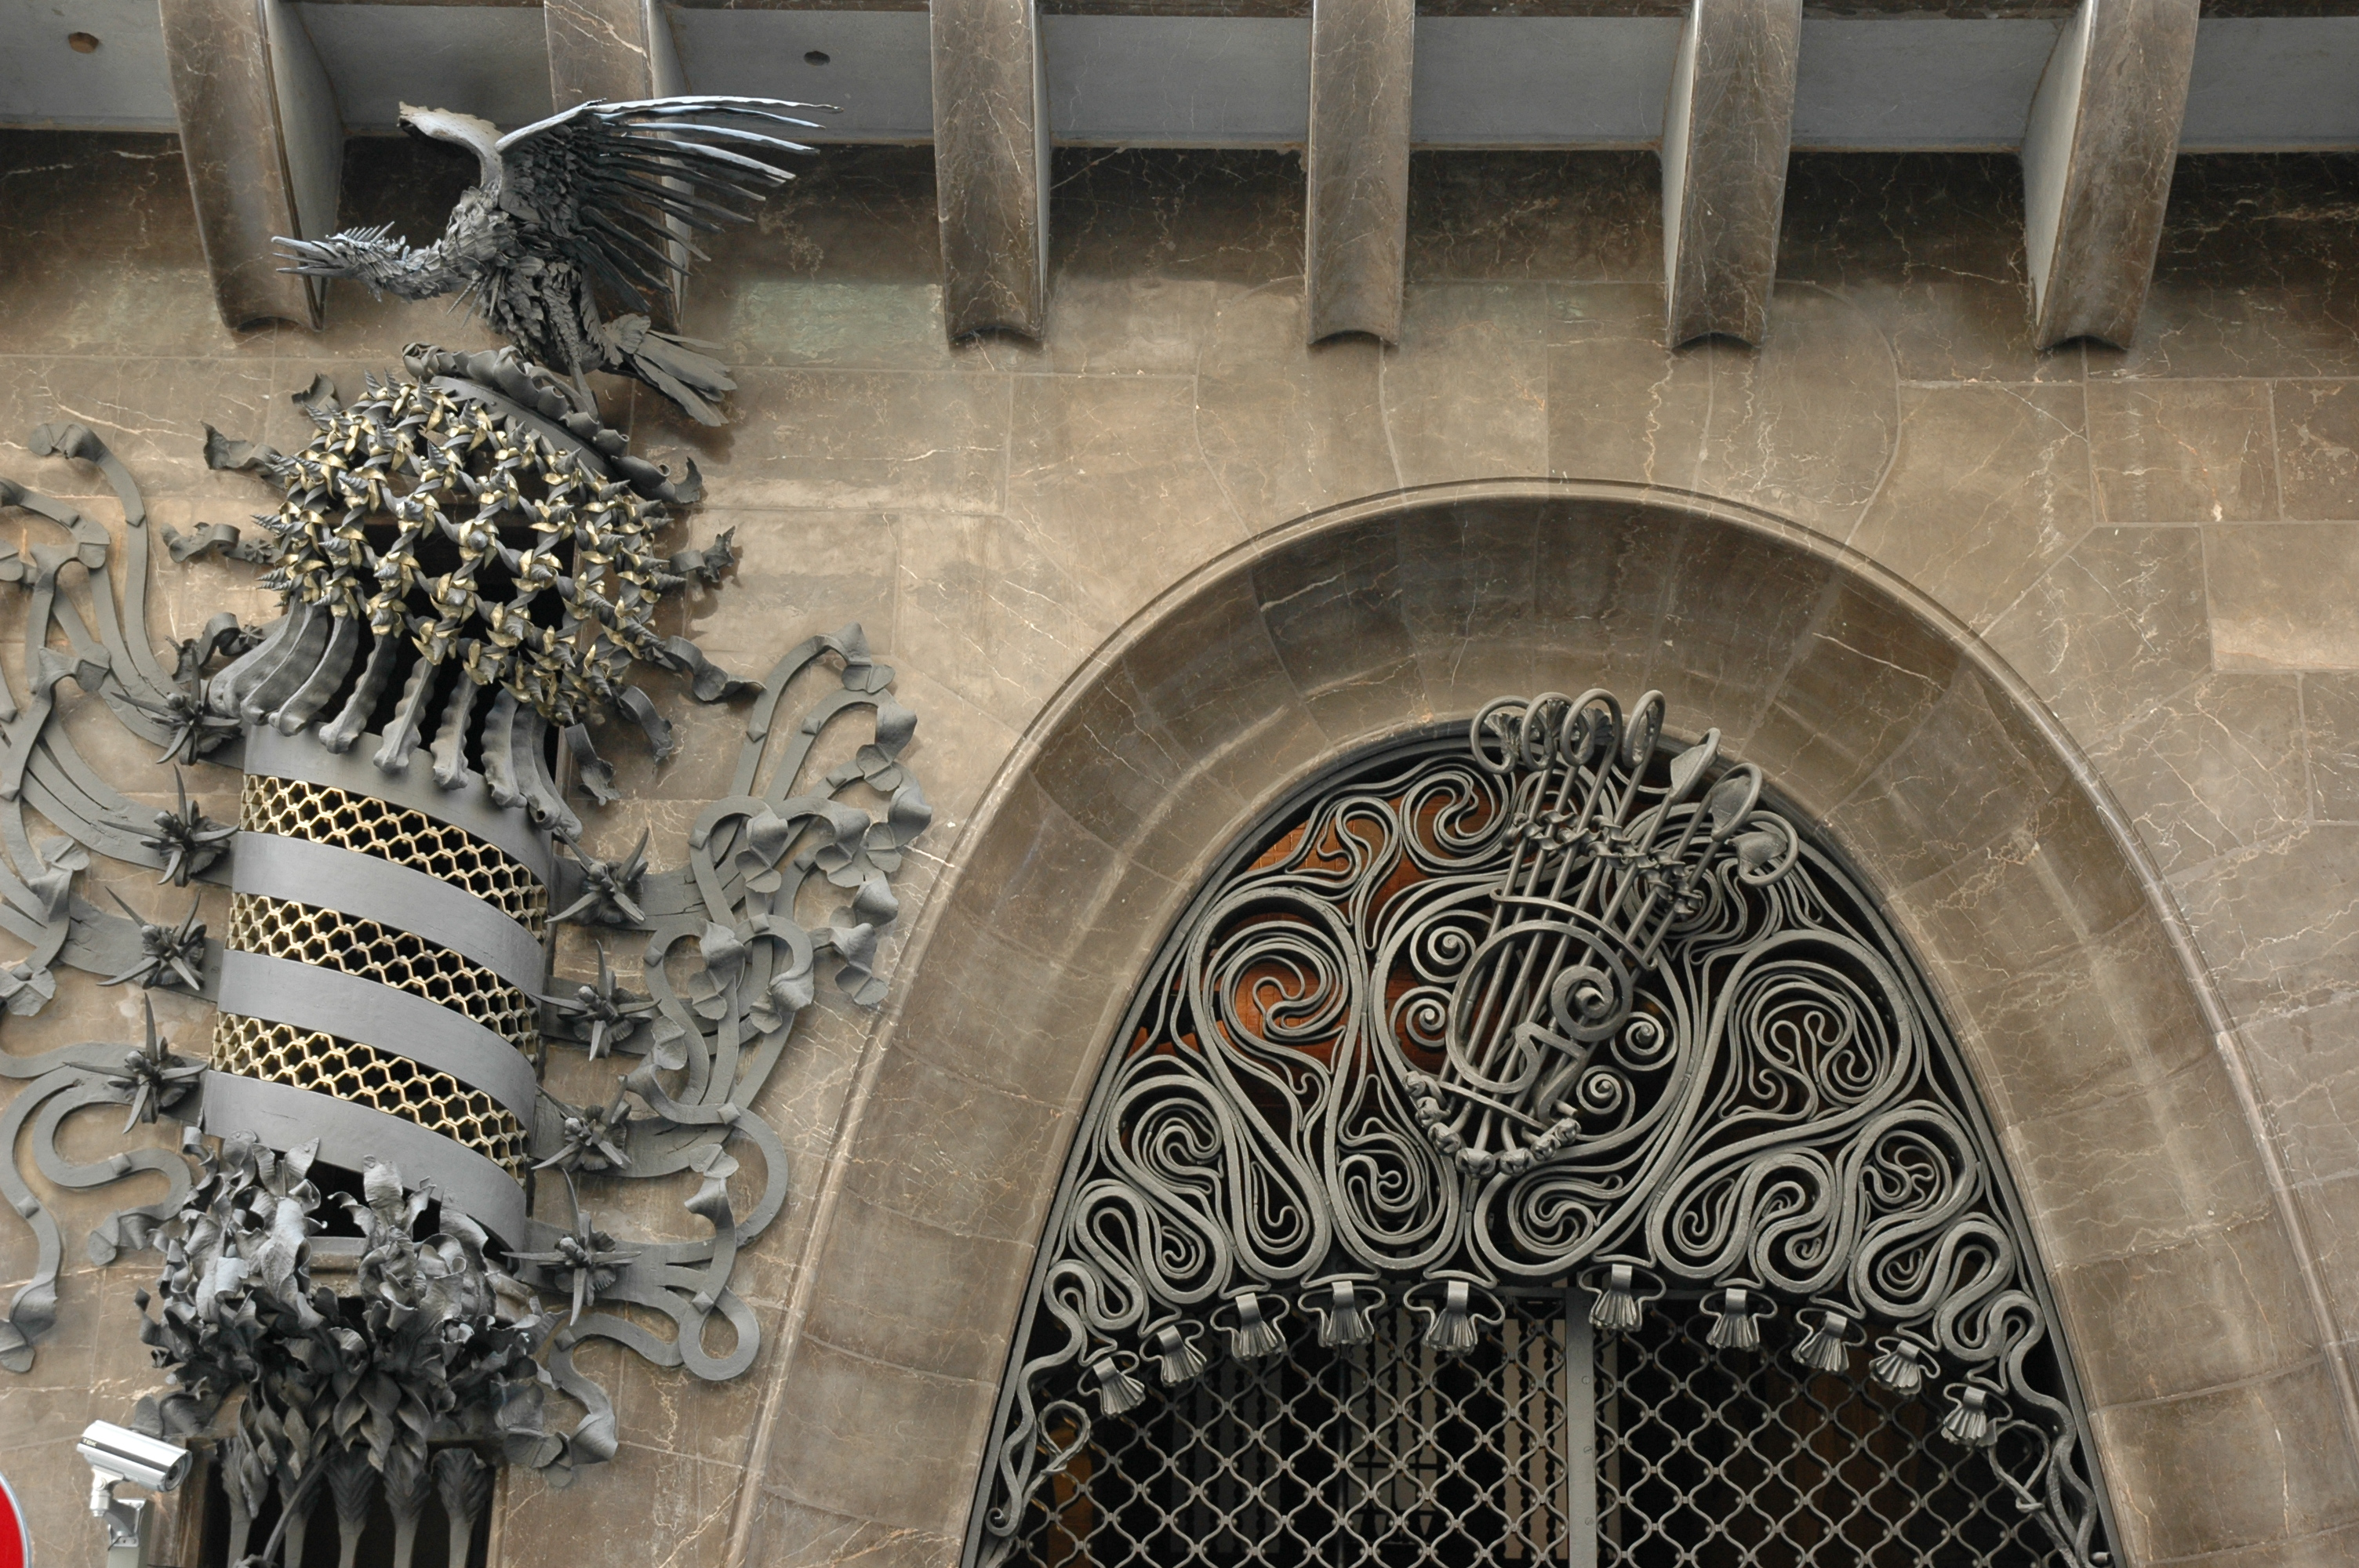 antoni gaudi architecture characteristics